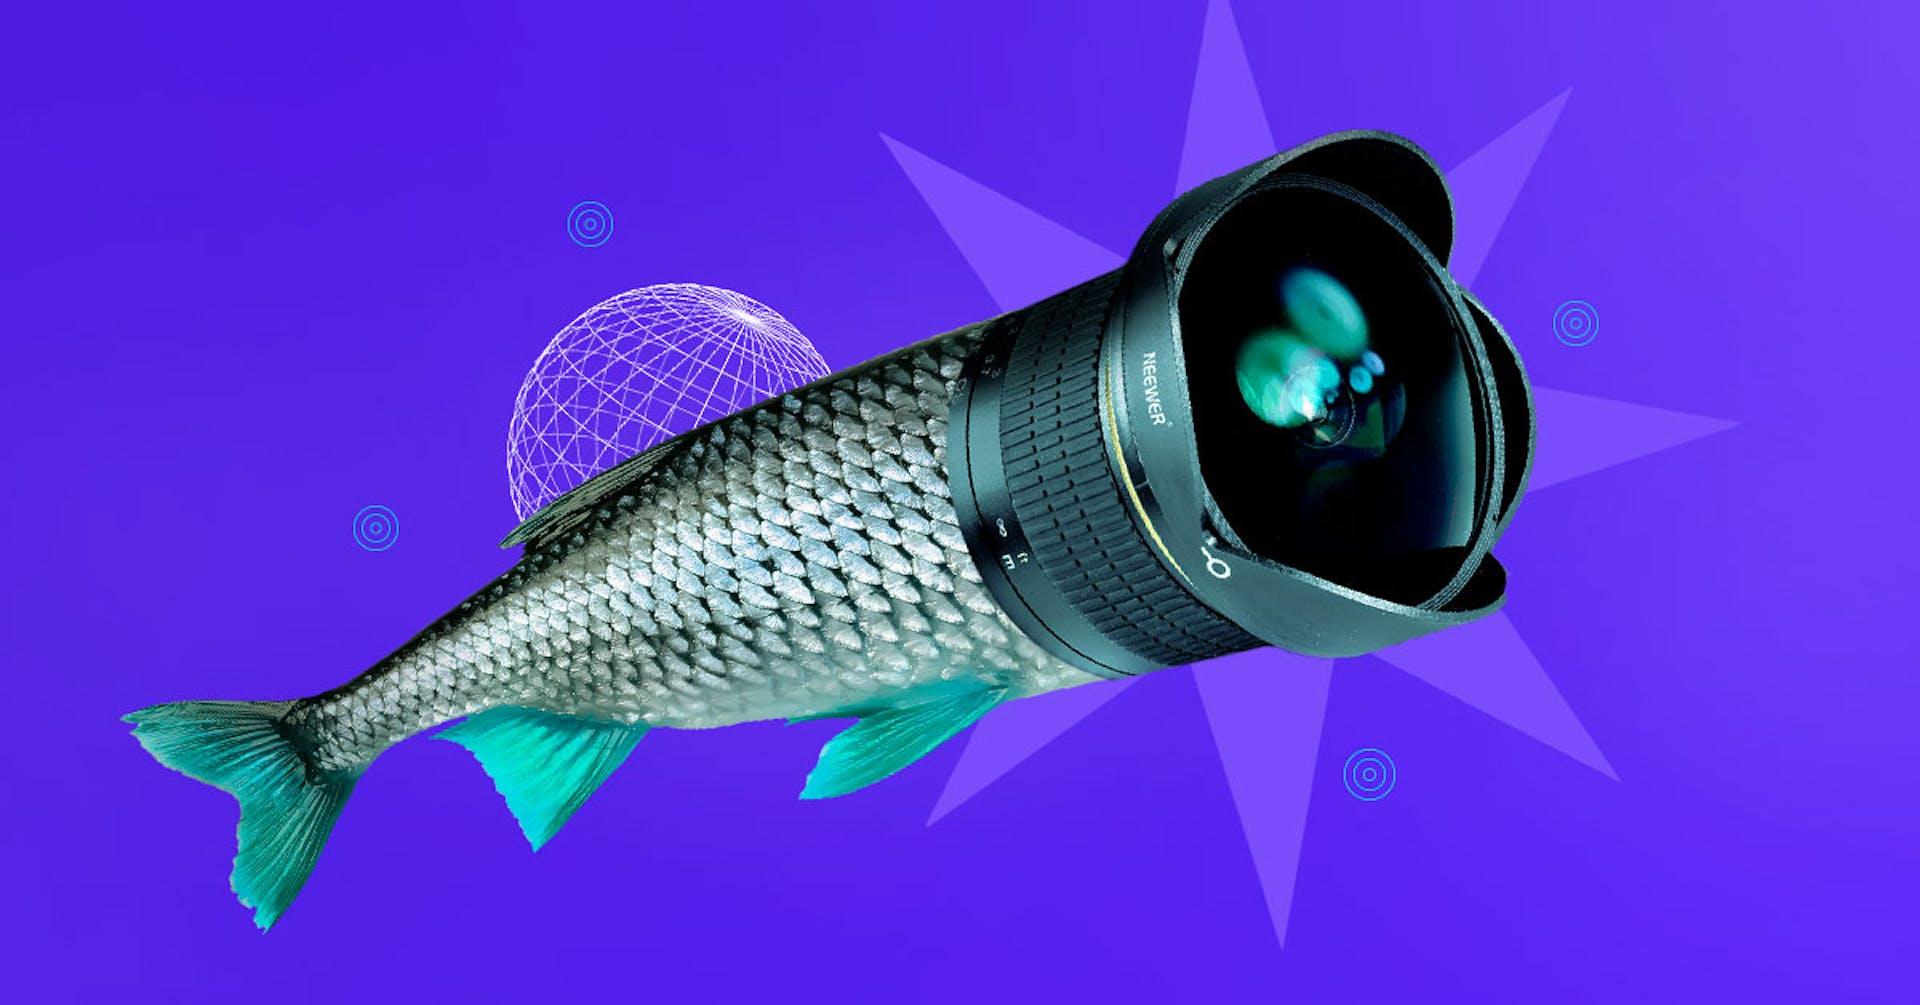 Lente ojo de pez: Ideas insuperables para sacar las mejores fotos